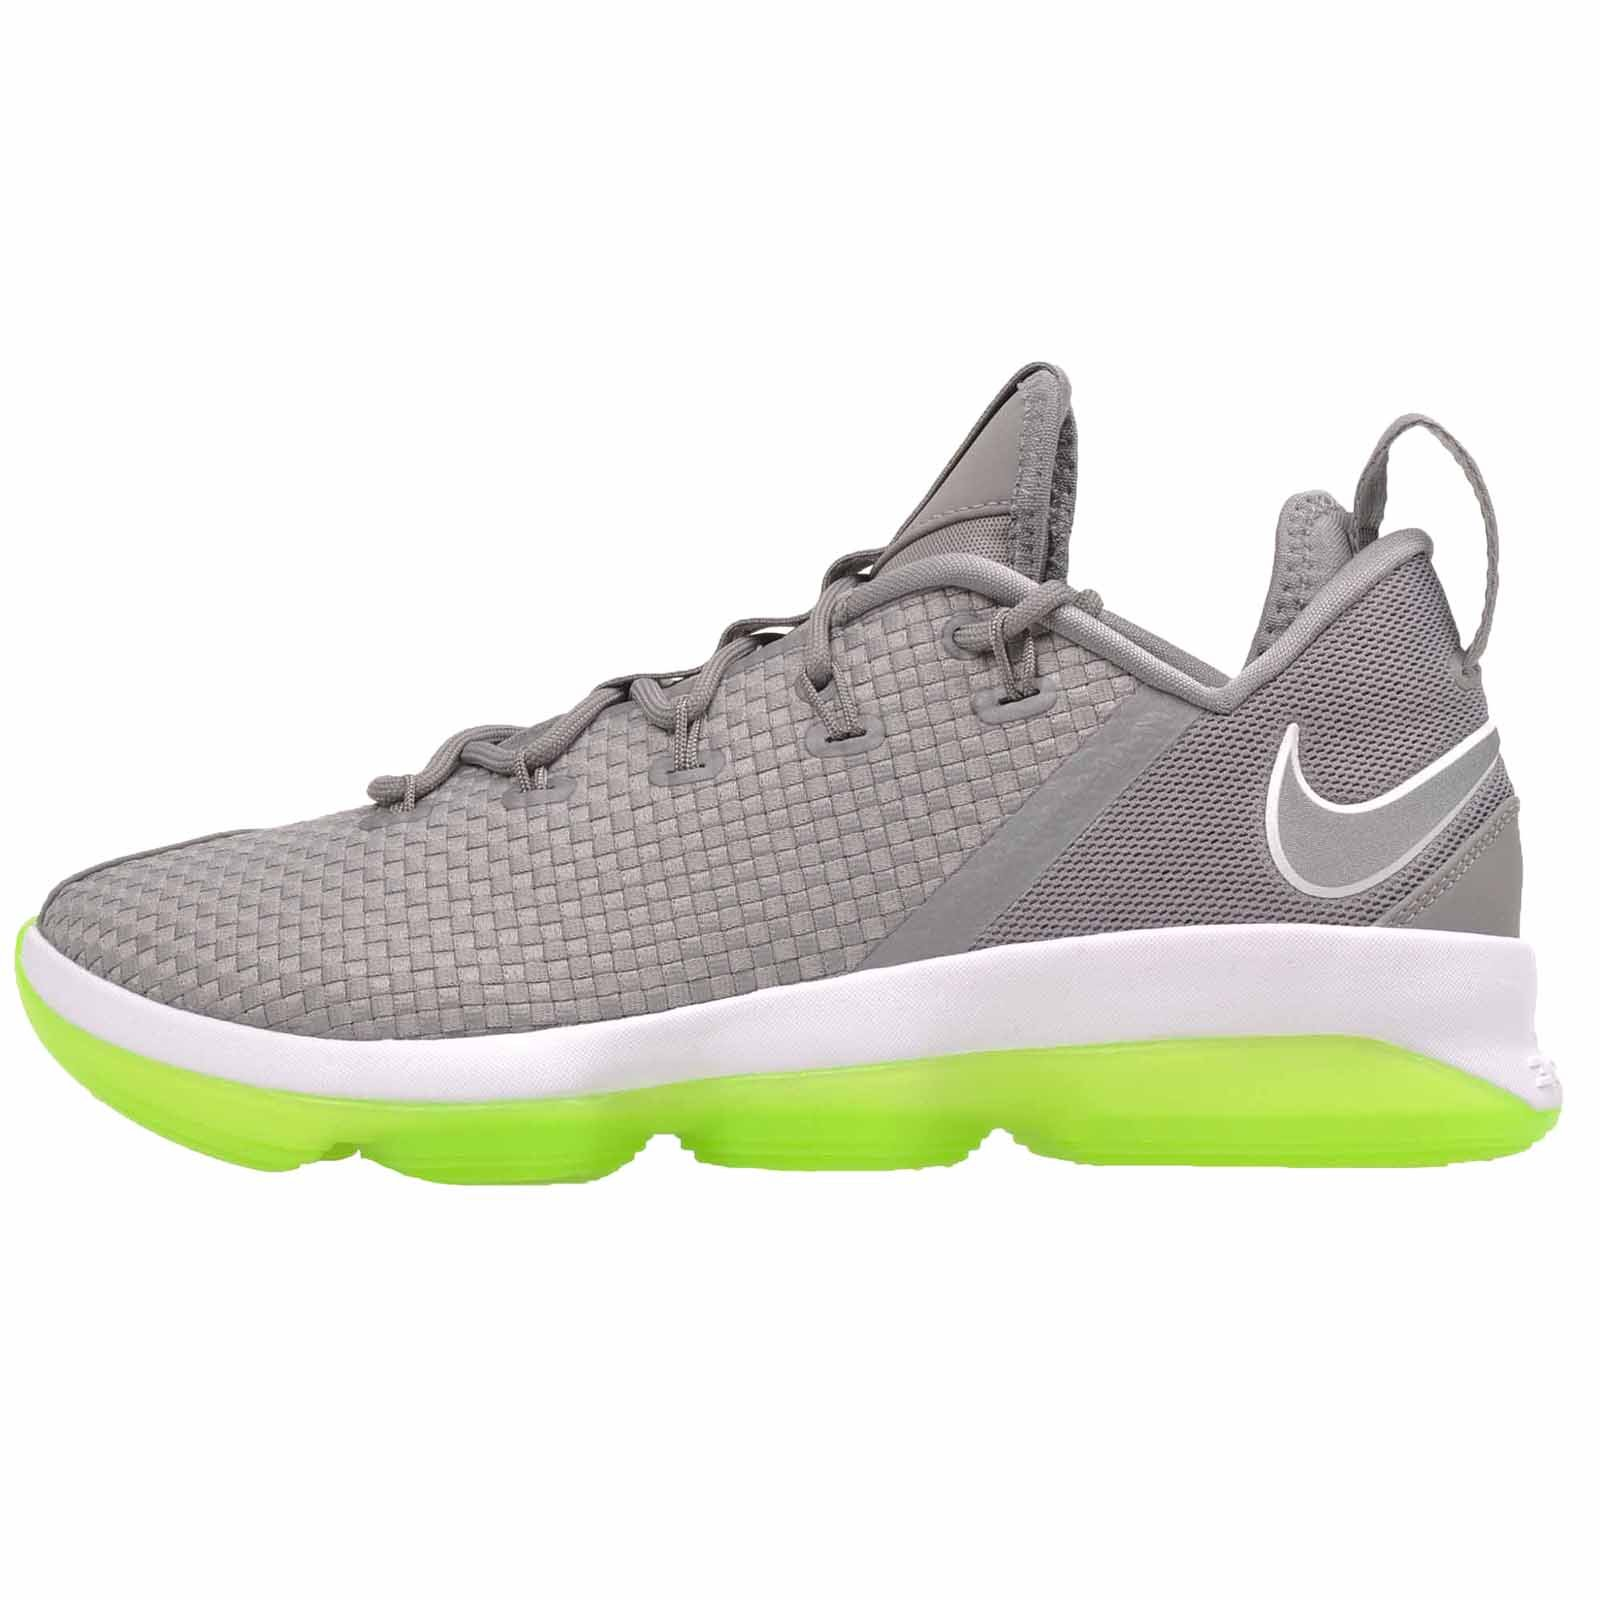 the latest 52490 e8a56 Nike Lebron XIV Low Mens Basketball Shoes (10.5)